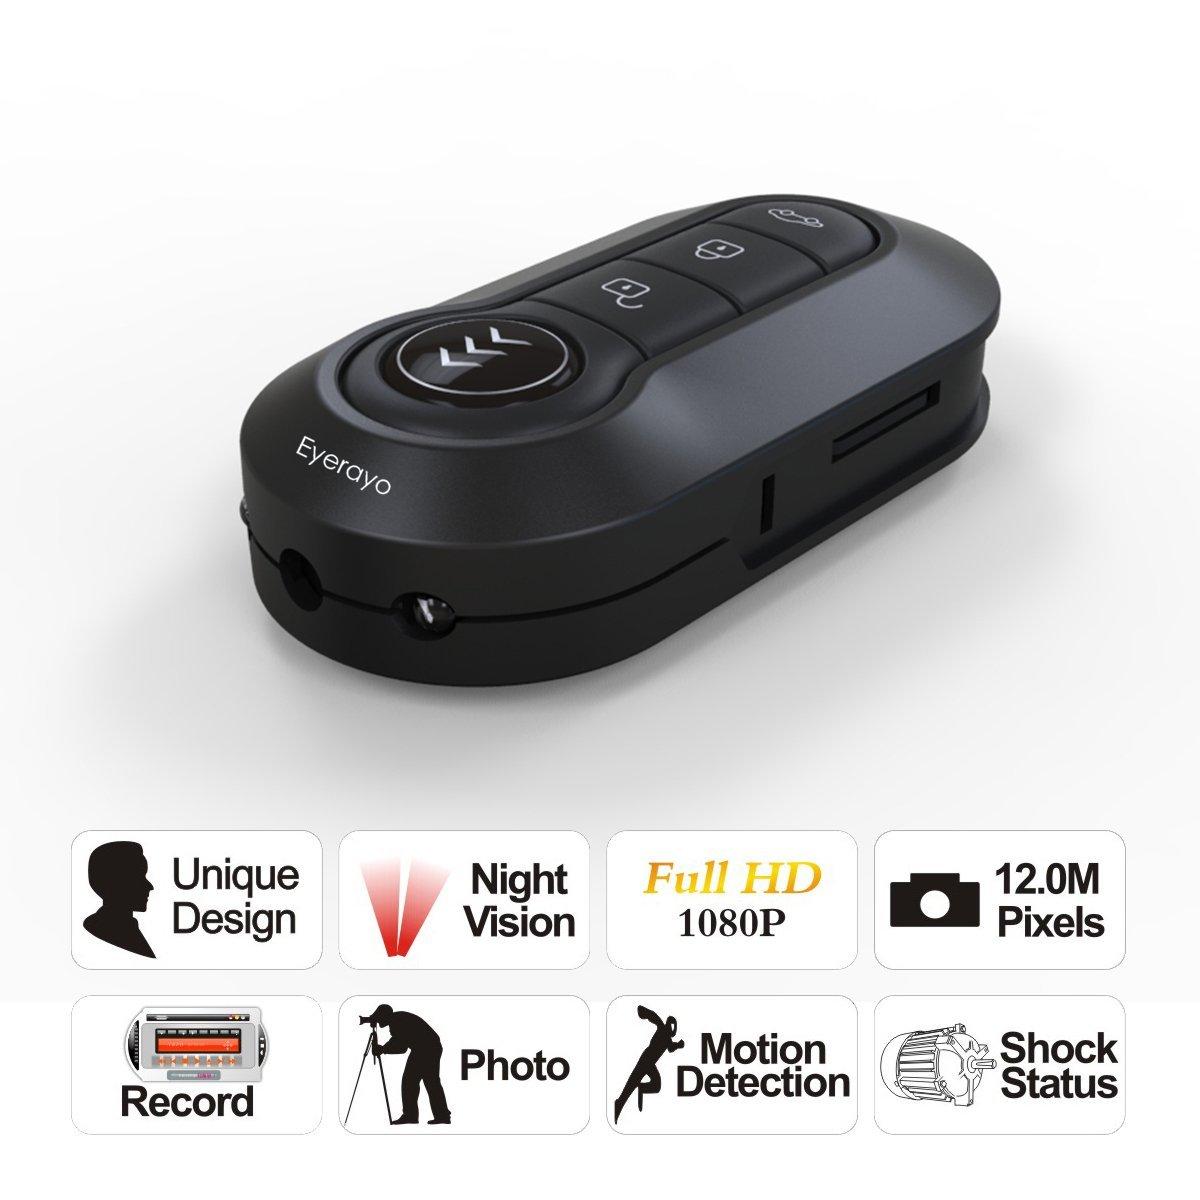 Mini Car Key Chain Dv Spion Spy Hidden Camera Camcorder Ir Night 1080p Vision Bug Cell Tv Video Audio Electronics Gadgets